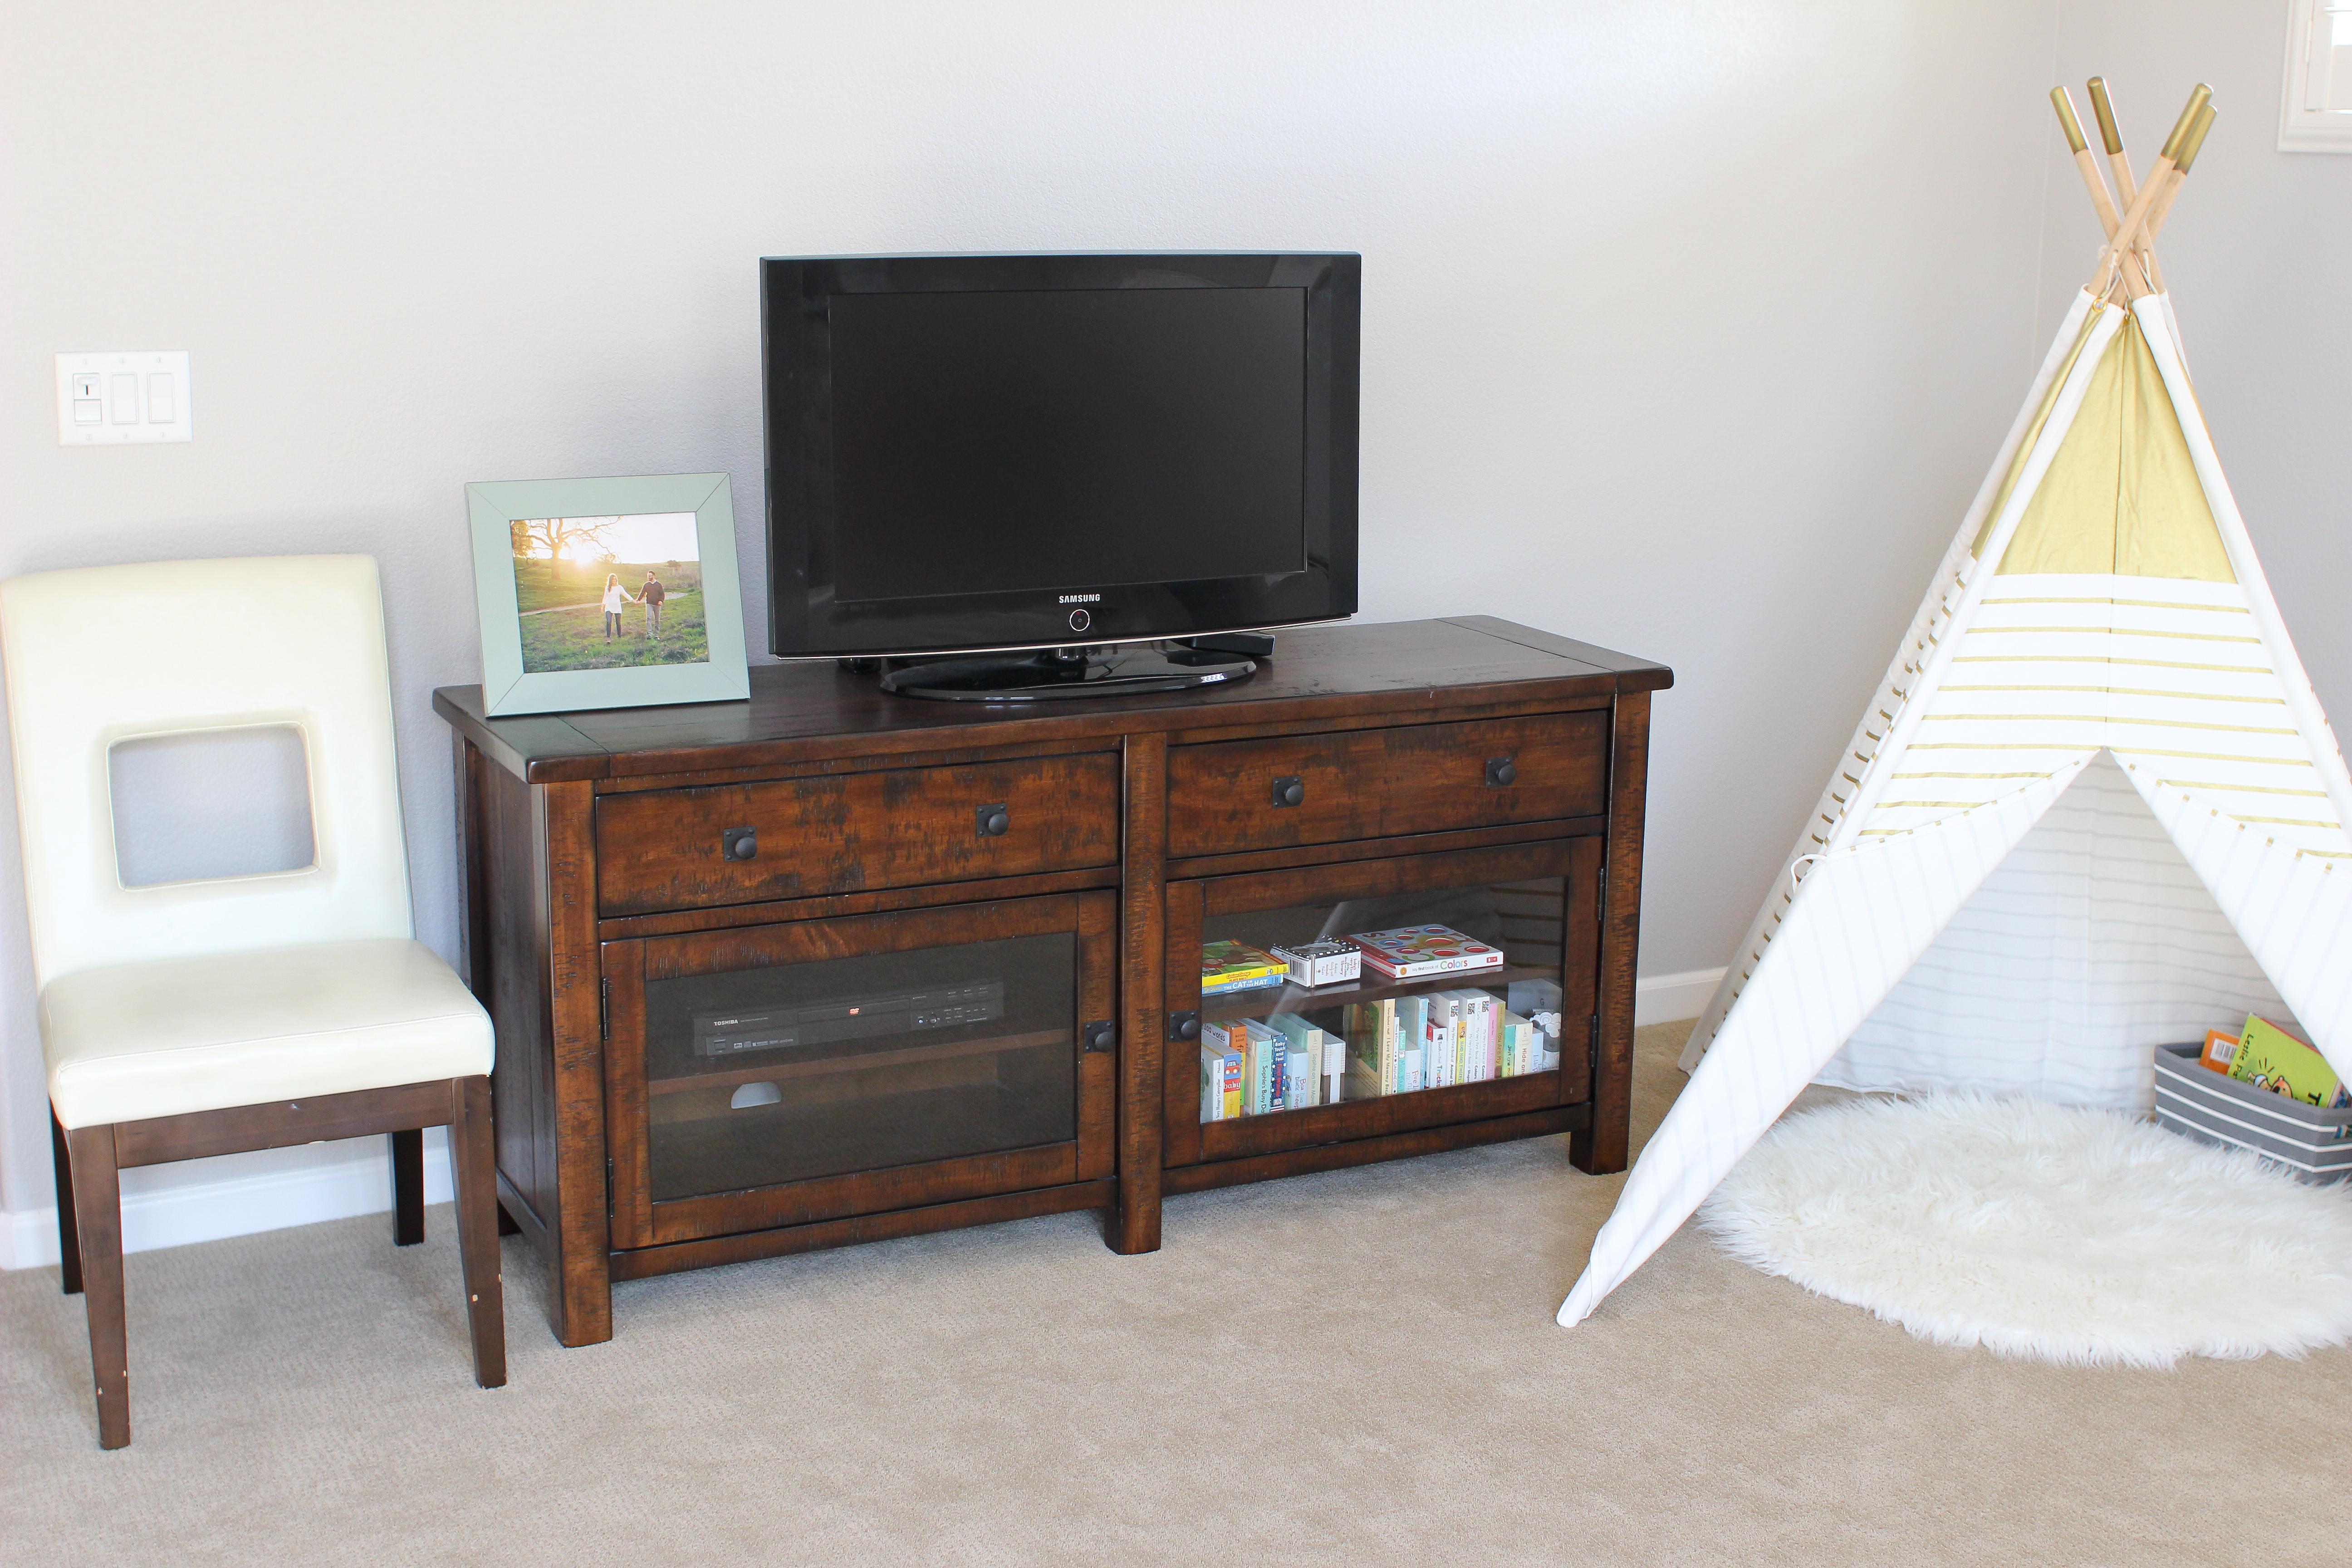 Modern, family-friendly playroom. Playroom Decor